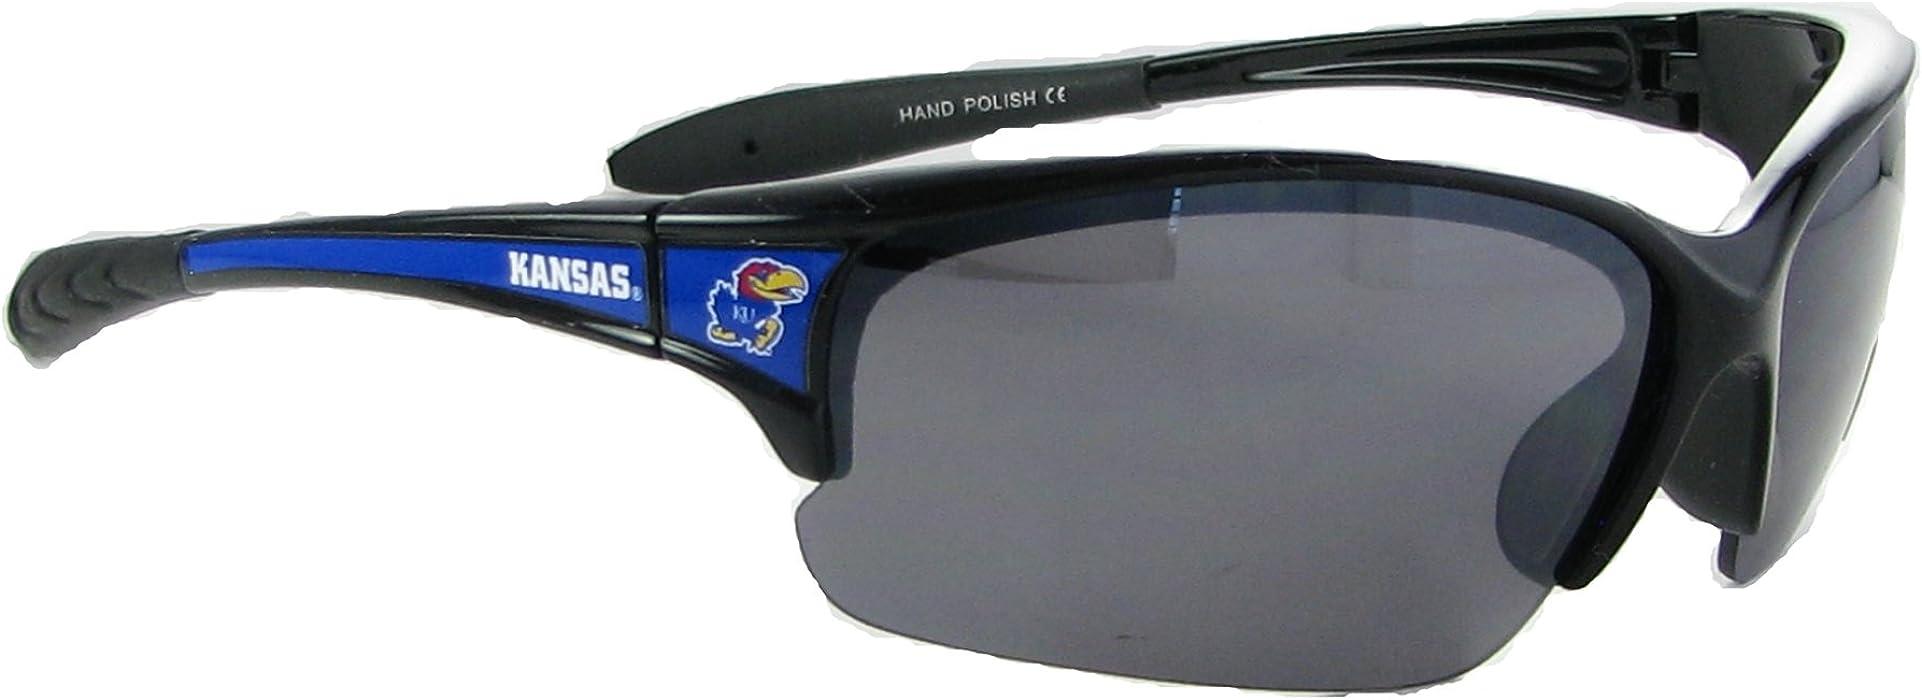 59d9f1b3bcce0 Amazon.com  Kansas Jayhawks KU Black Blue Elite Mens Sunglasses S7JT ...